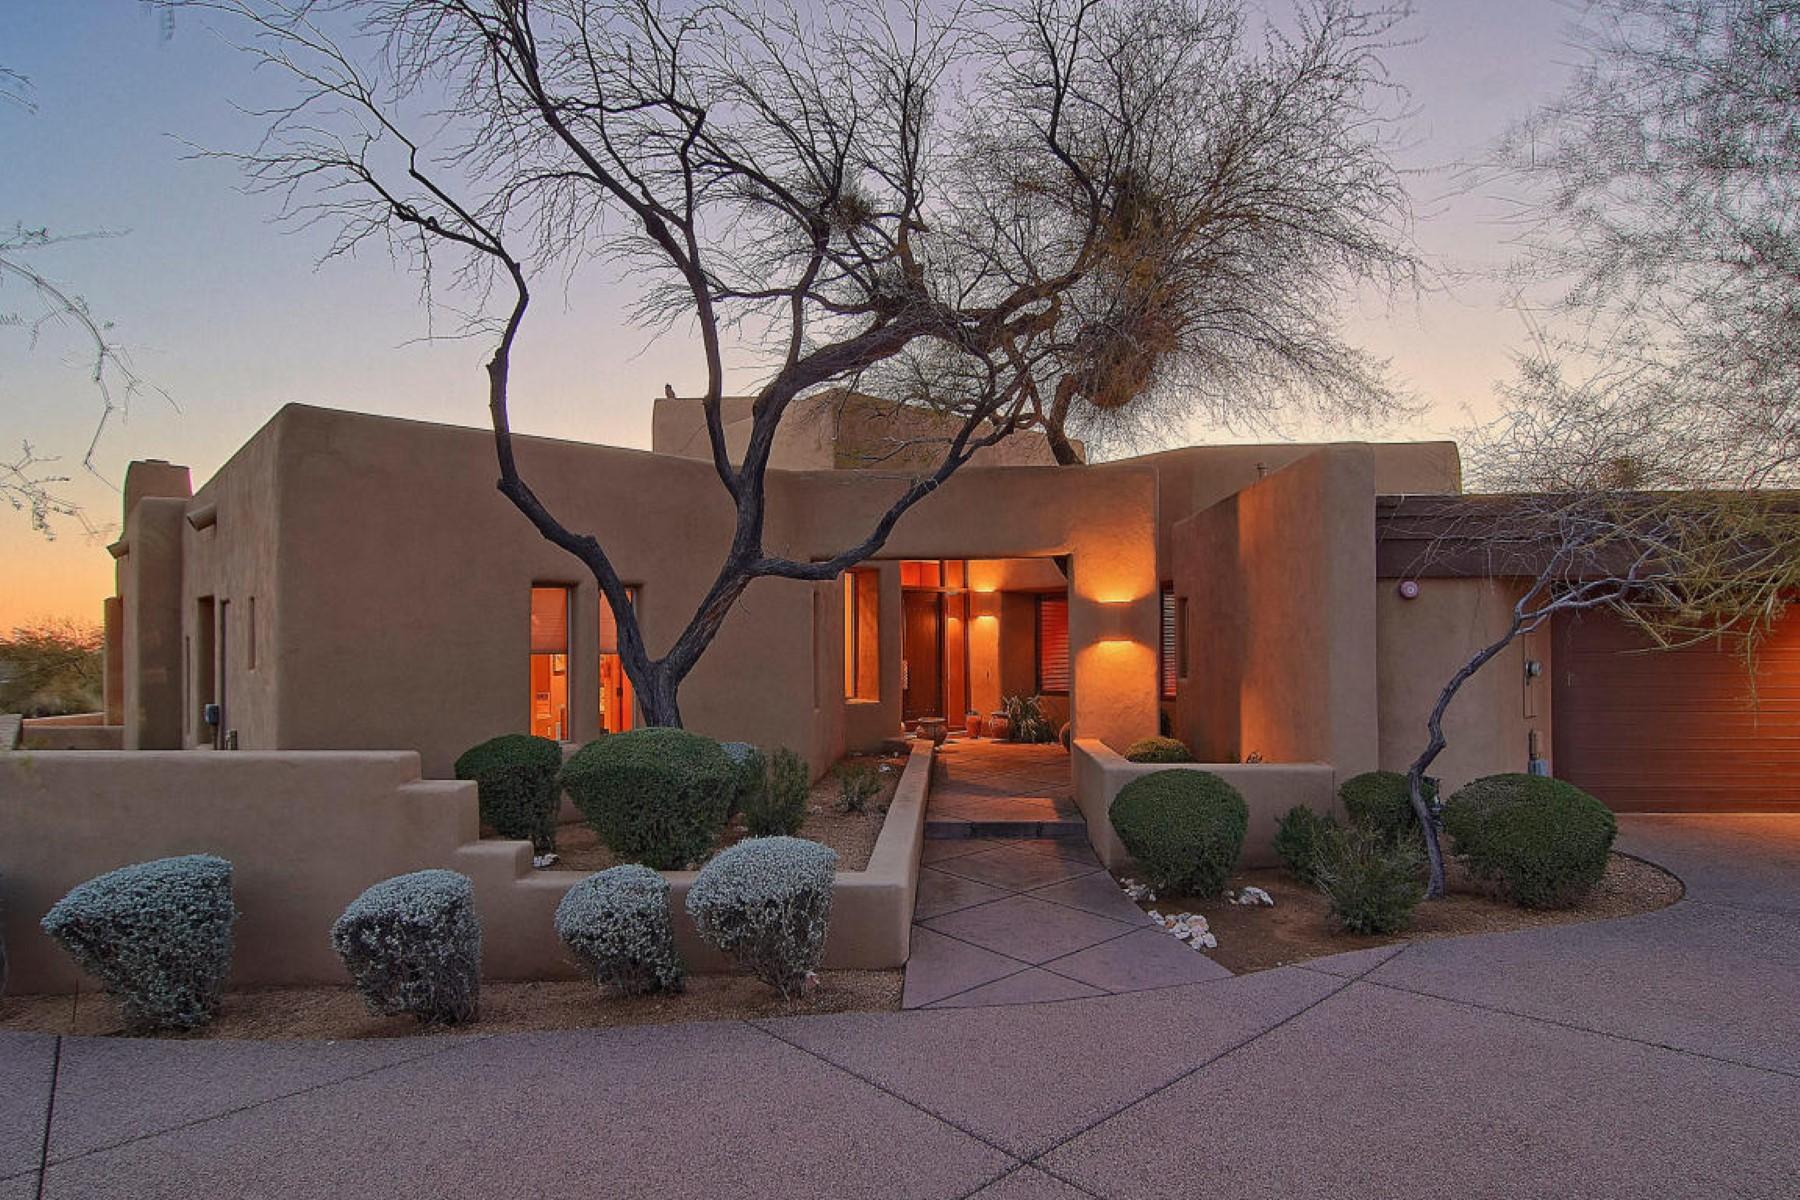 独户住宅 为 销售 在 Charming Cochise Ridge home in Scottsdale 41528 N 107th Way, 斯科茨代尔, 亚利桑那州, 85262 美国